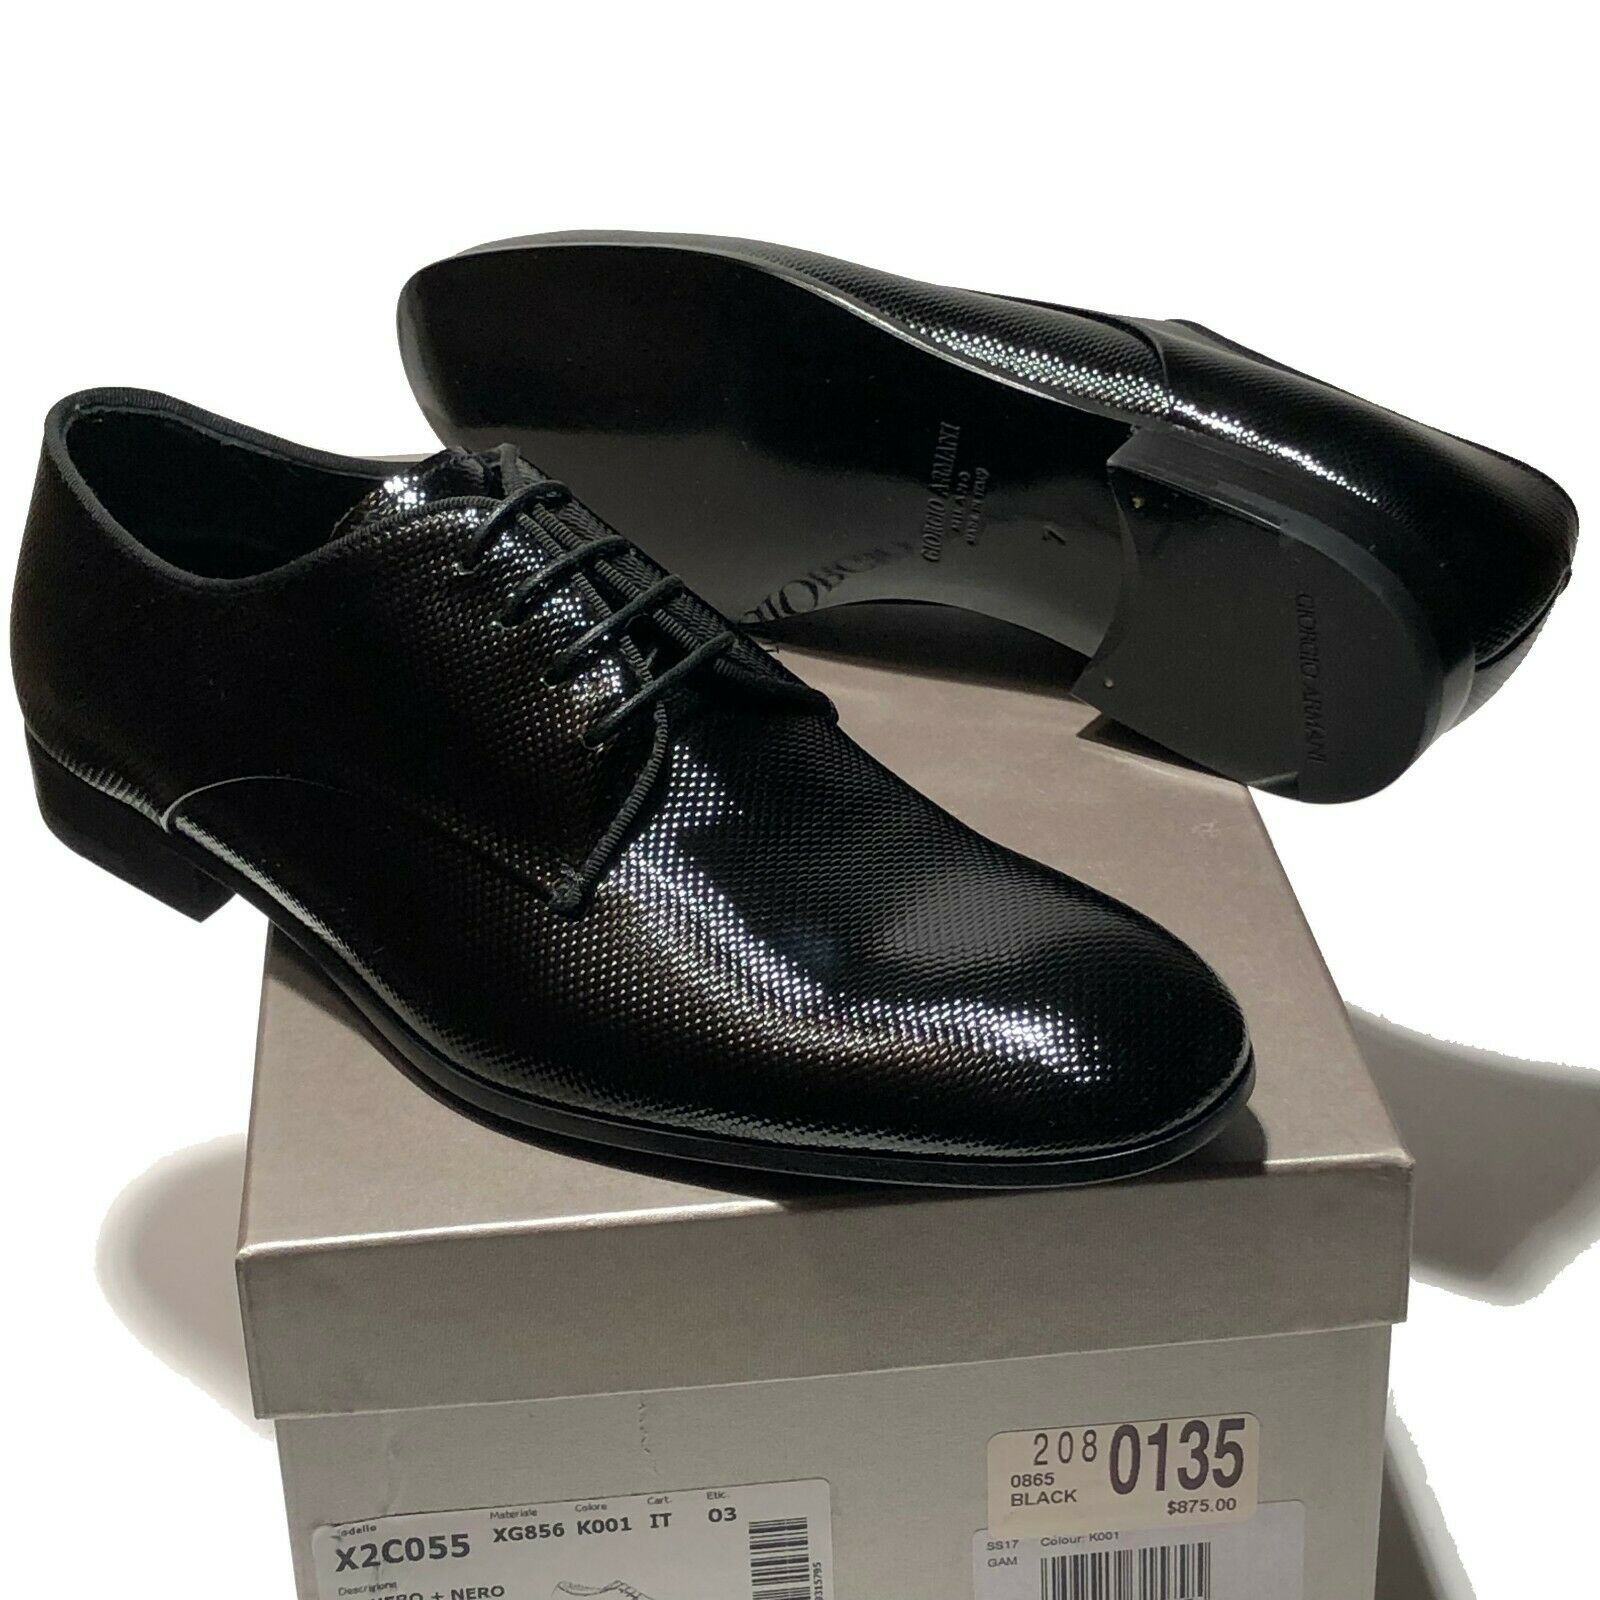 875 Armani Pebbled Patent Leather Formal Dress Wedding Oxford 8.5 Men's Tuxedo